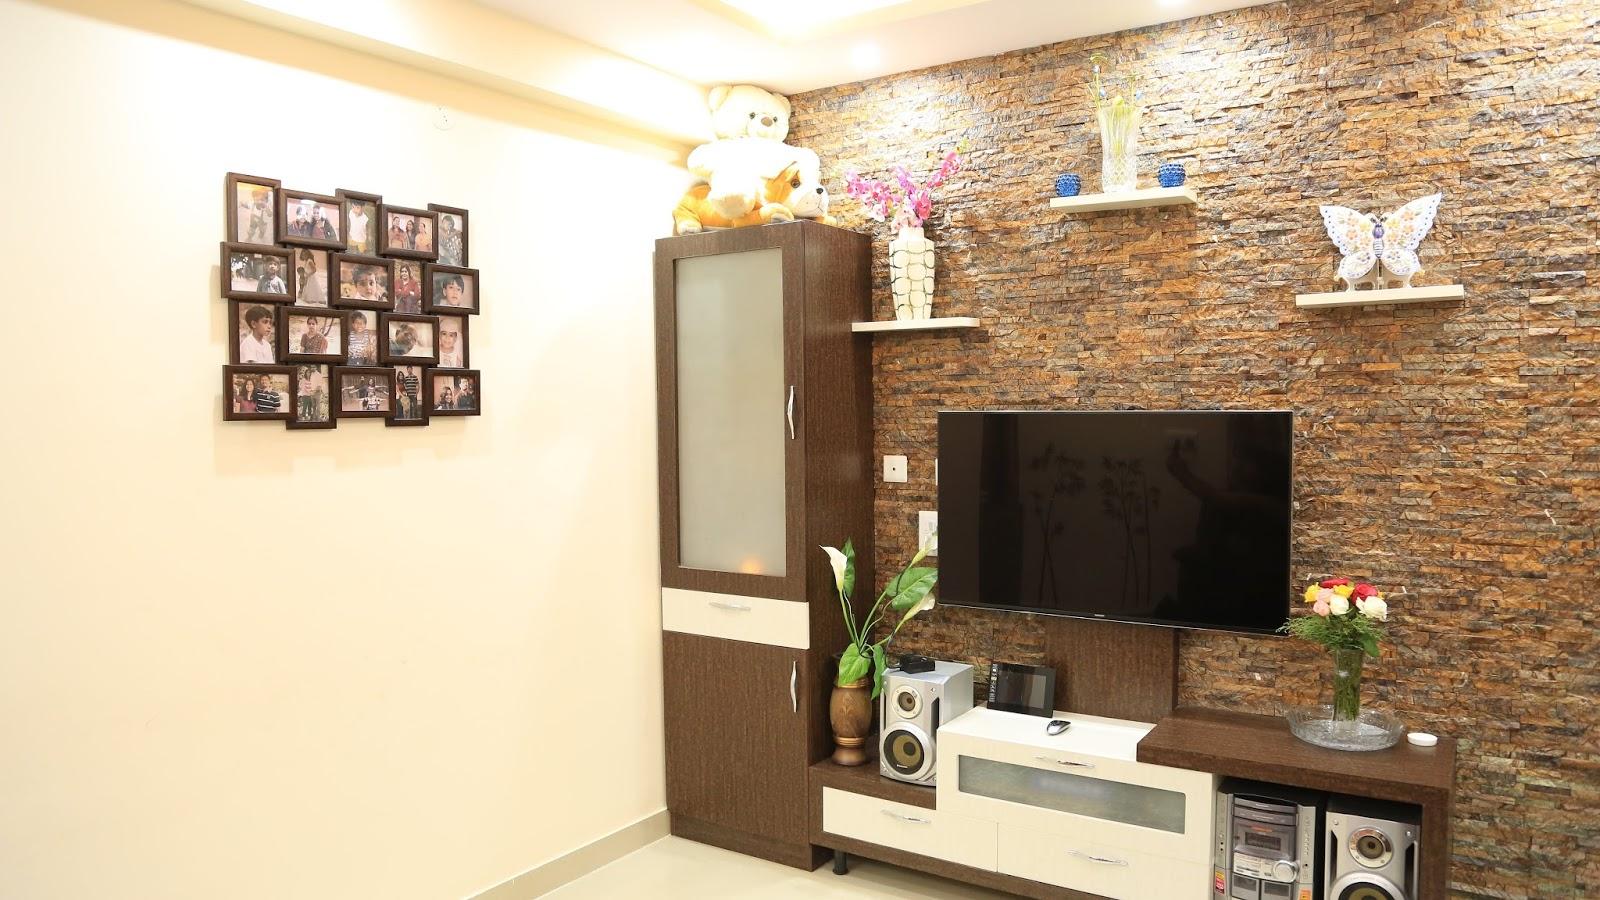 Koncept living interior concepts living room interior for Interior designing ideas for living room